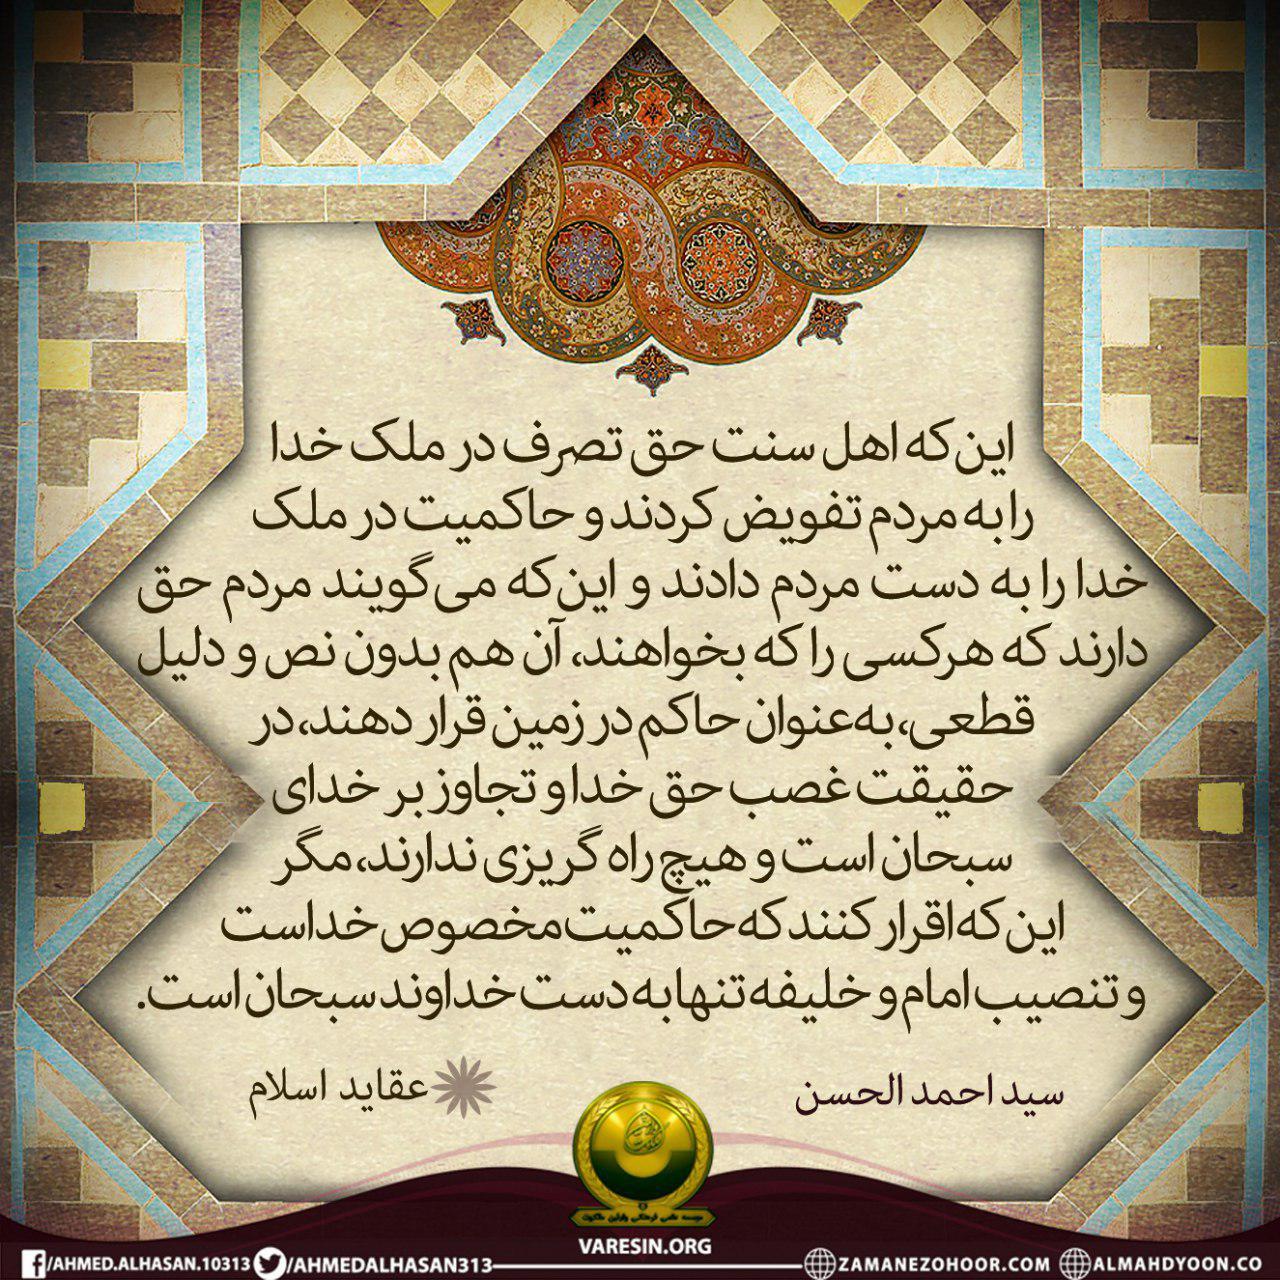 گالری عکس نوشته «عقاید اسلام در کلام امام احمد الحسن»